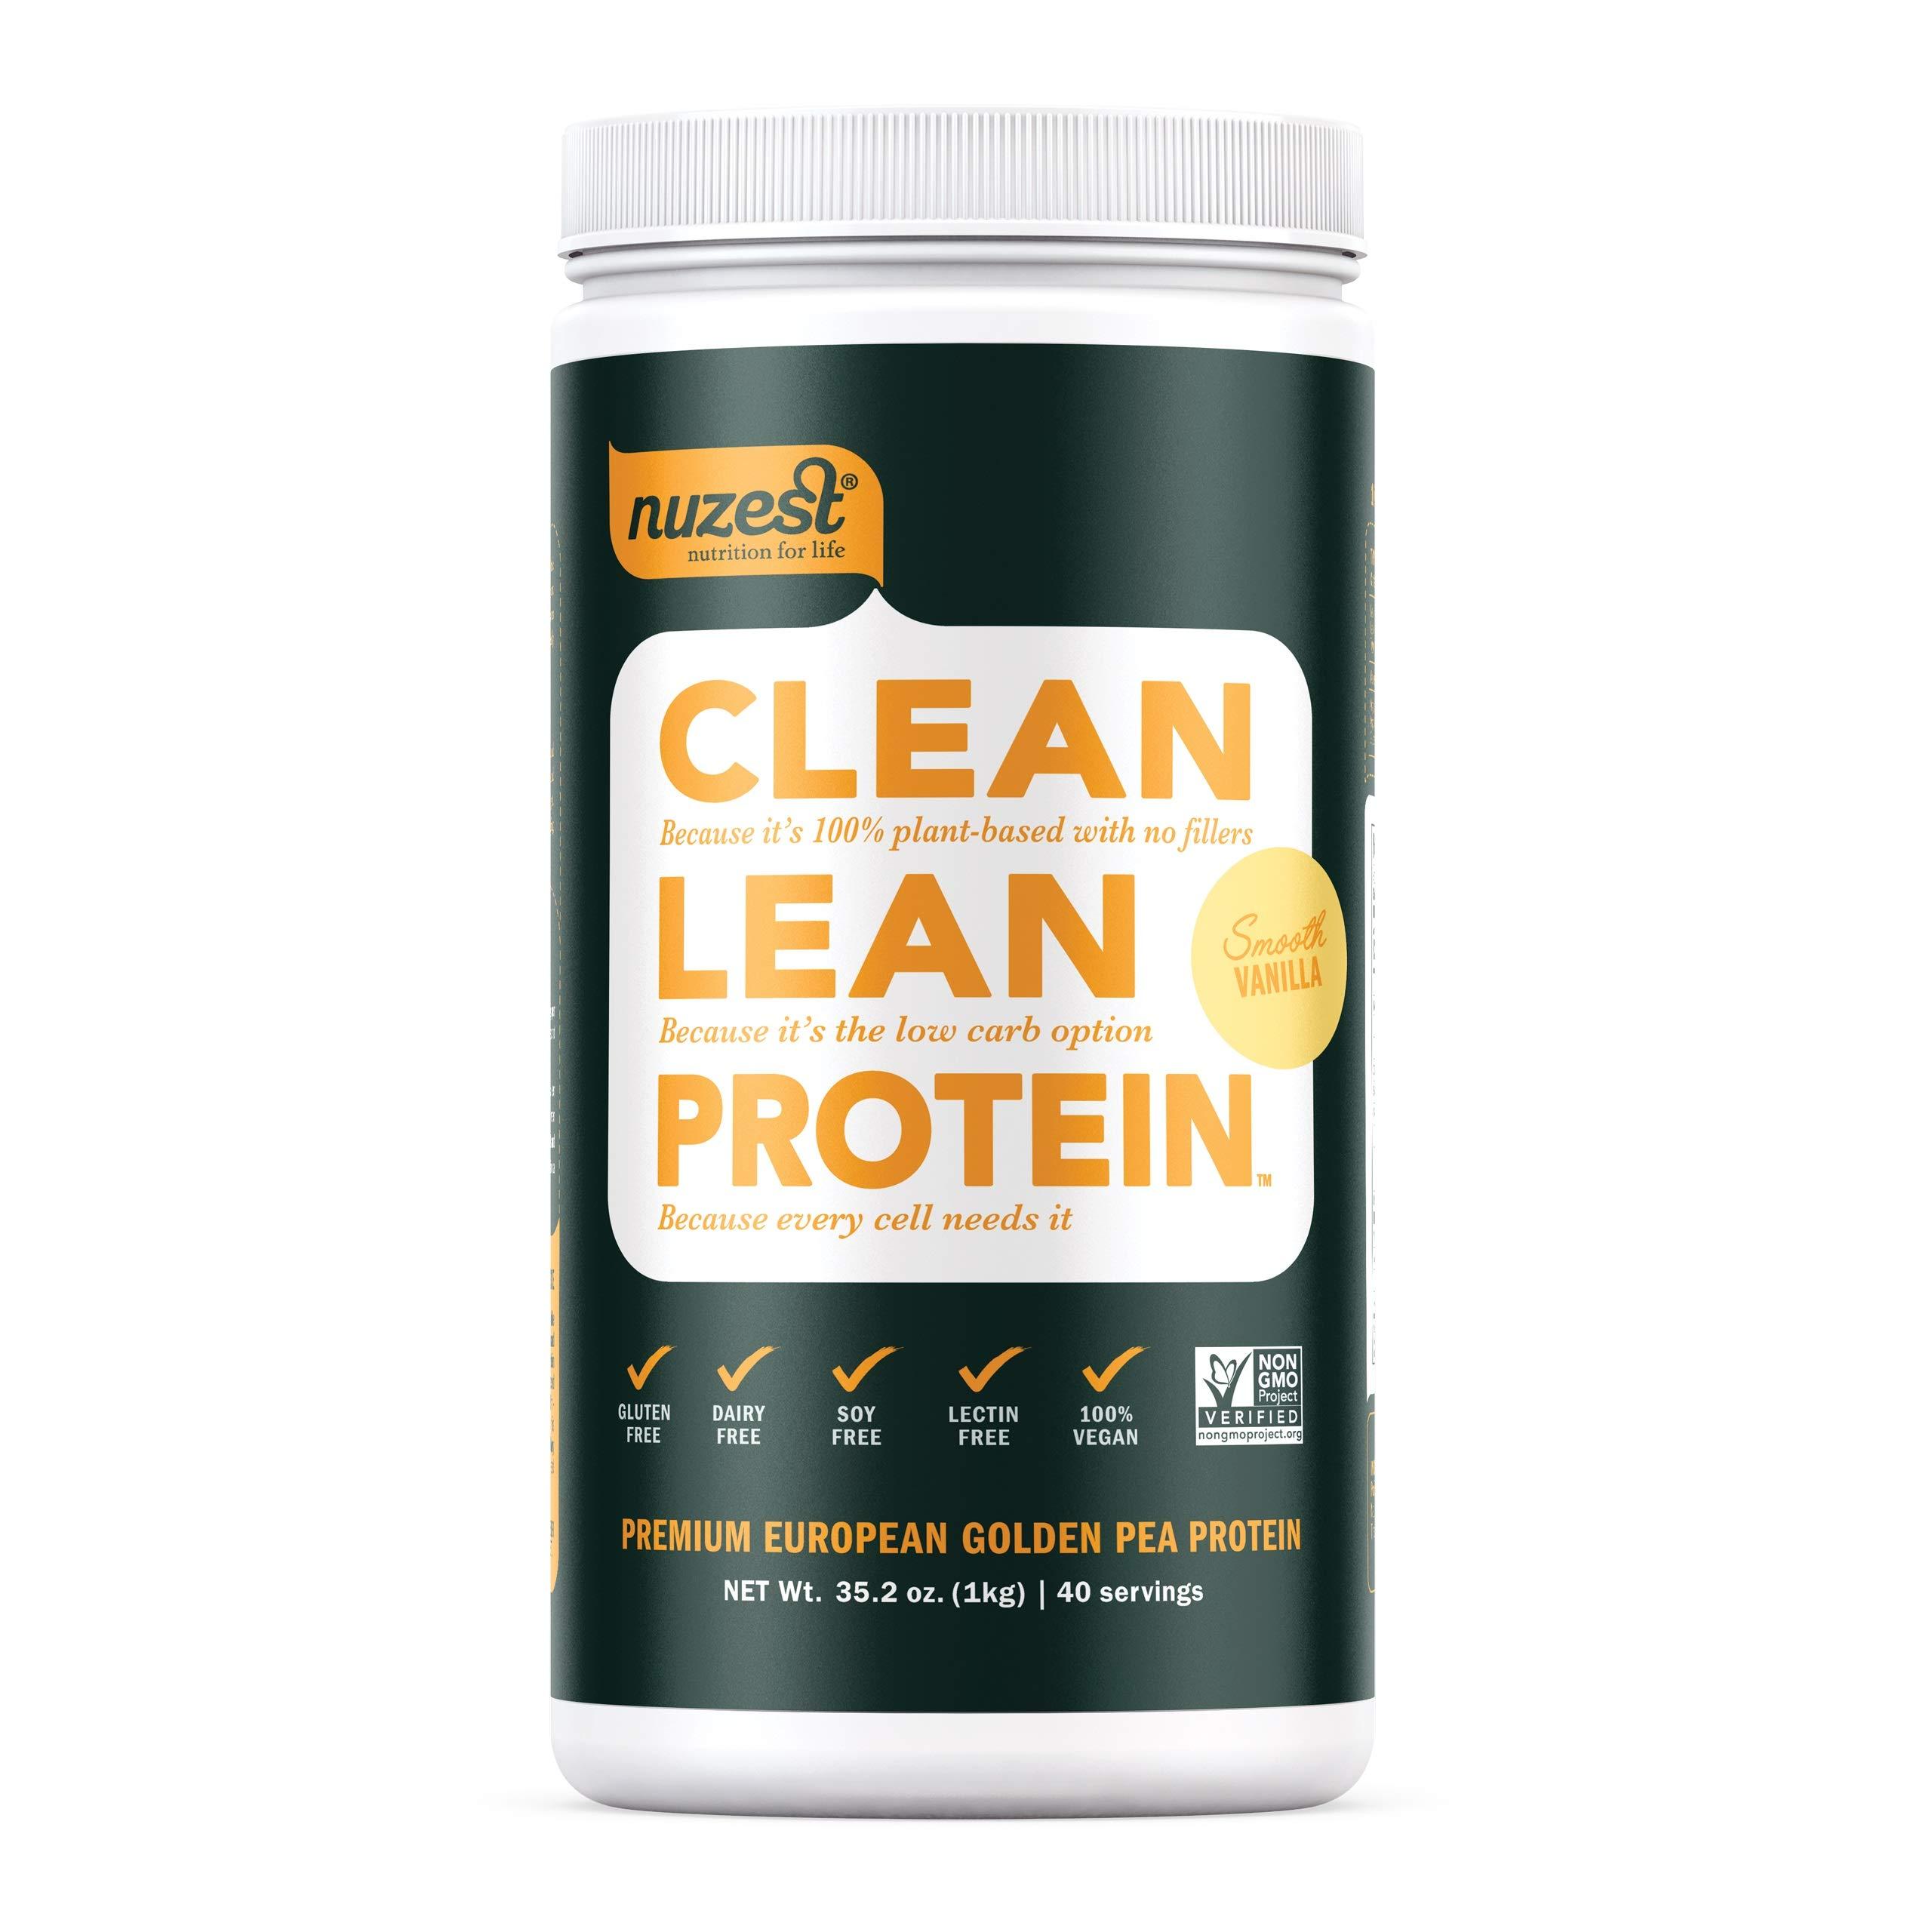 Nuzest Clean Lean Protein - Premium Vegan Protein Powder, Plant Protein Powder, European Golden Pea Protein, Dairy Free, Gluten Free, GMO Free, Naturally Sweetened, Smooth Vanilla, 40 Servings, 2.2 lb by NuZest